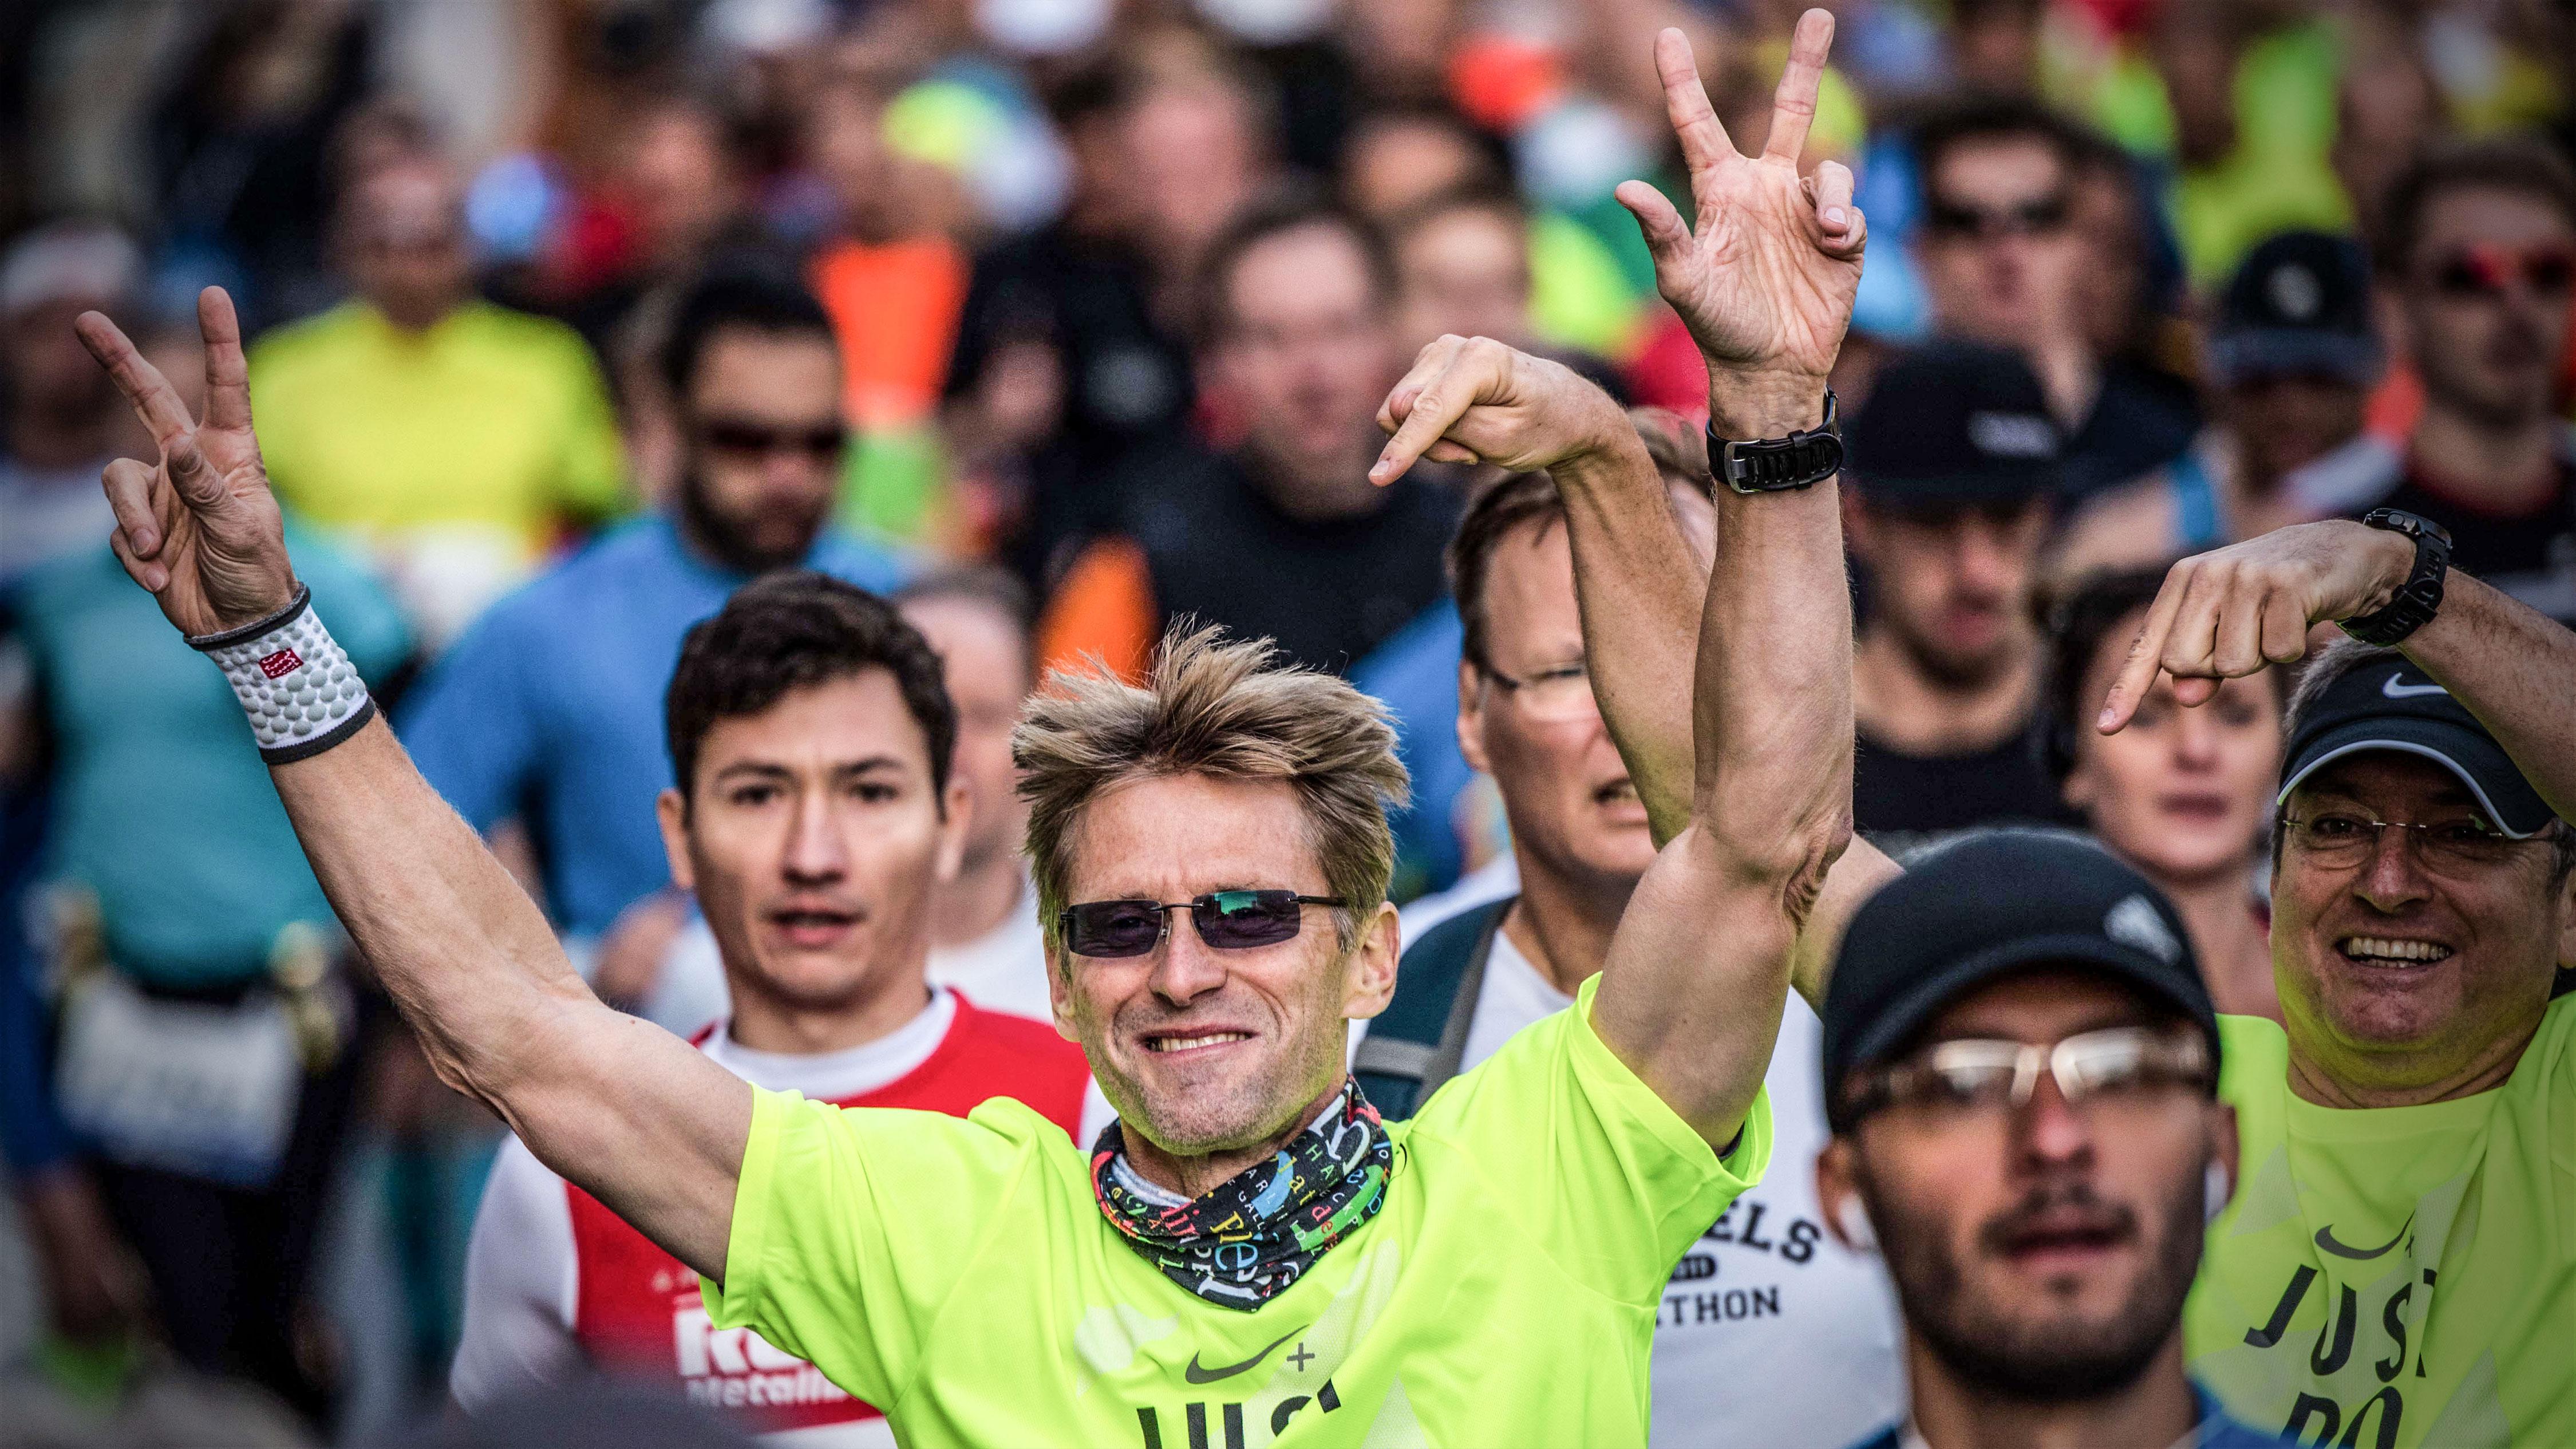 mainova 2016 neu eins - Ausatmen Fans Usa